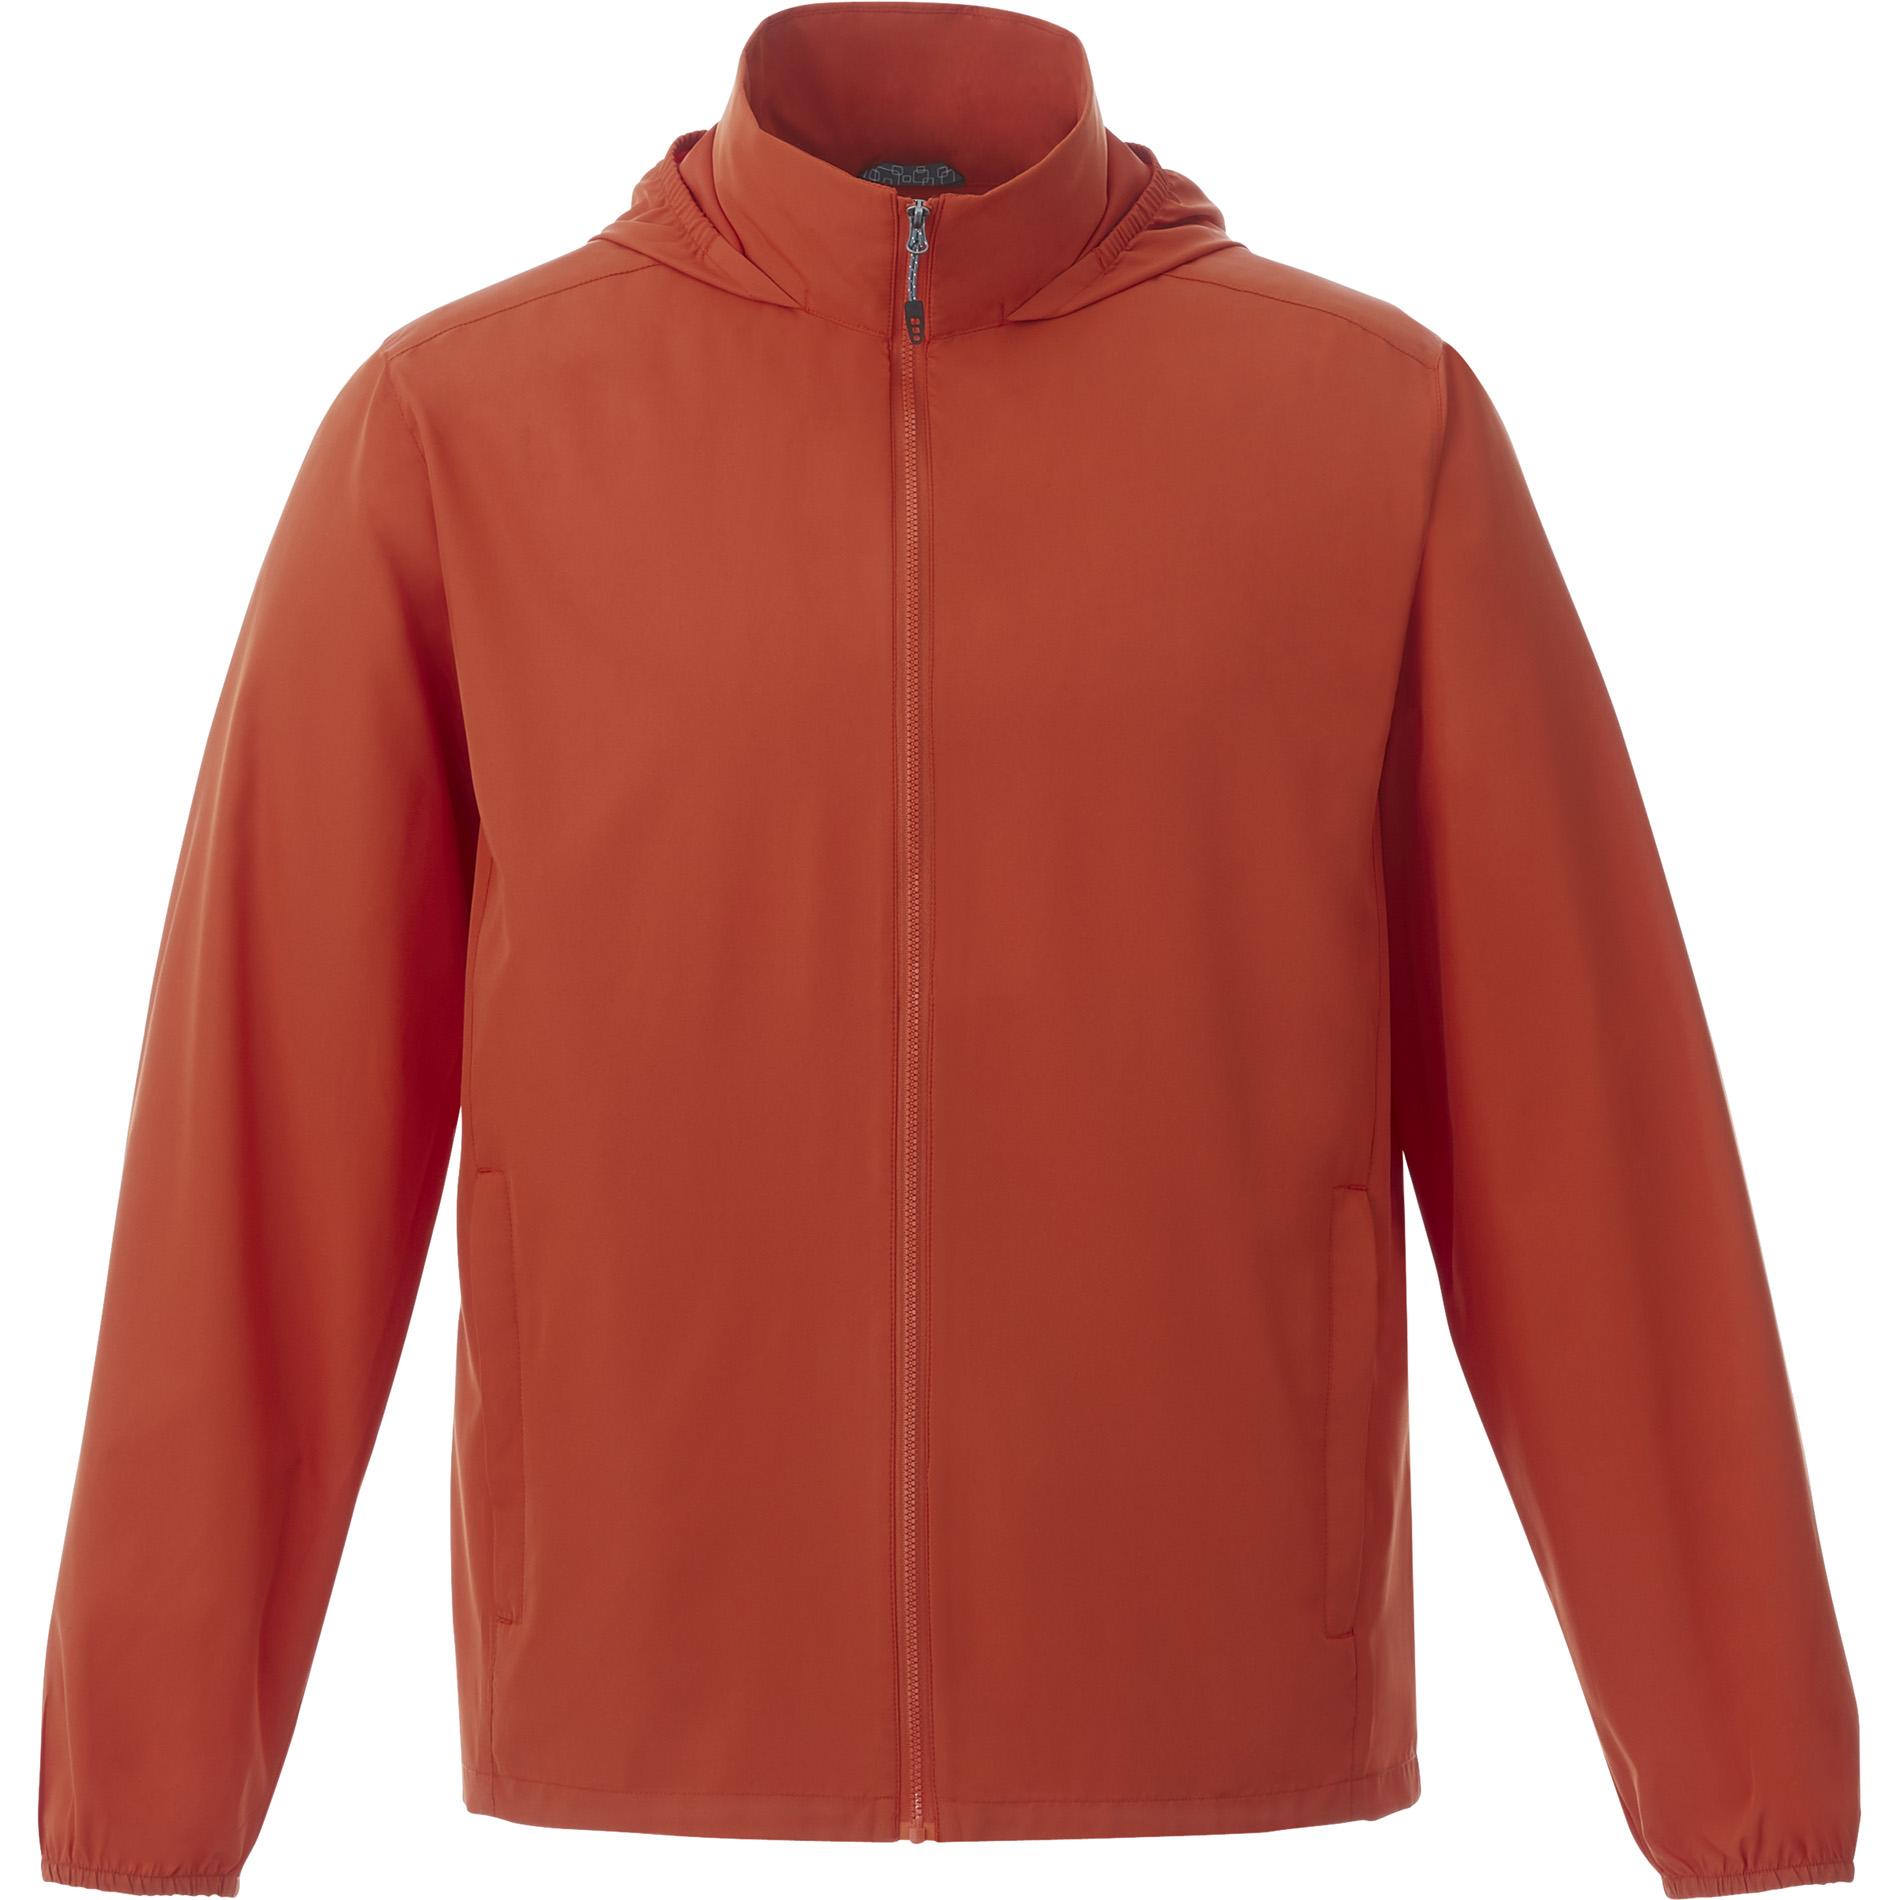 Elevate TM12608 - Men's TOBA Packable Jacket